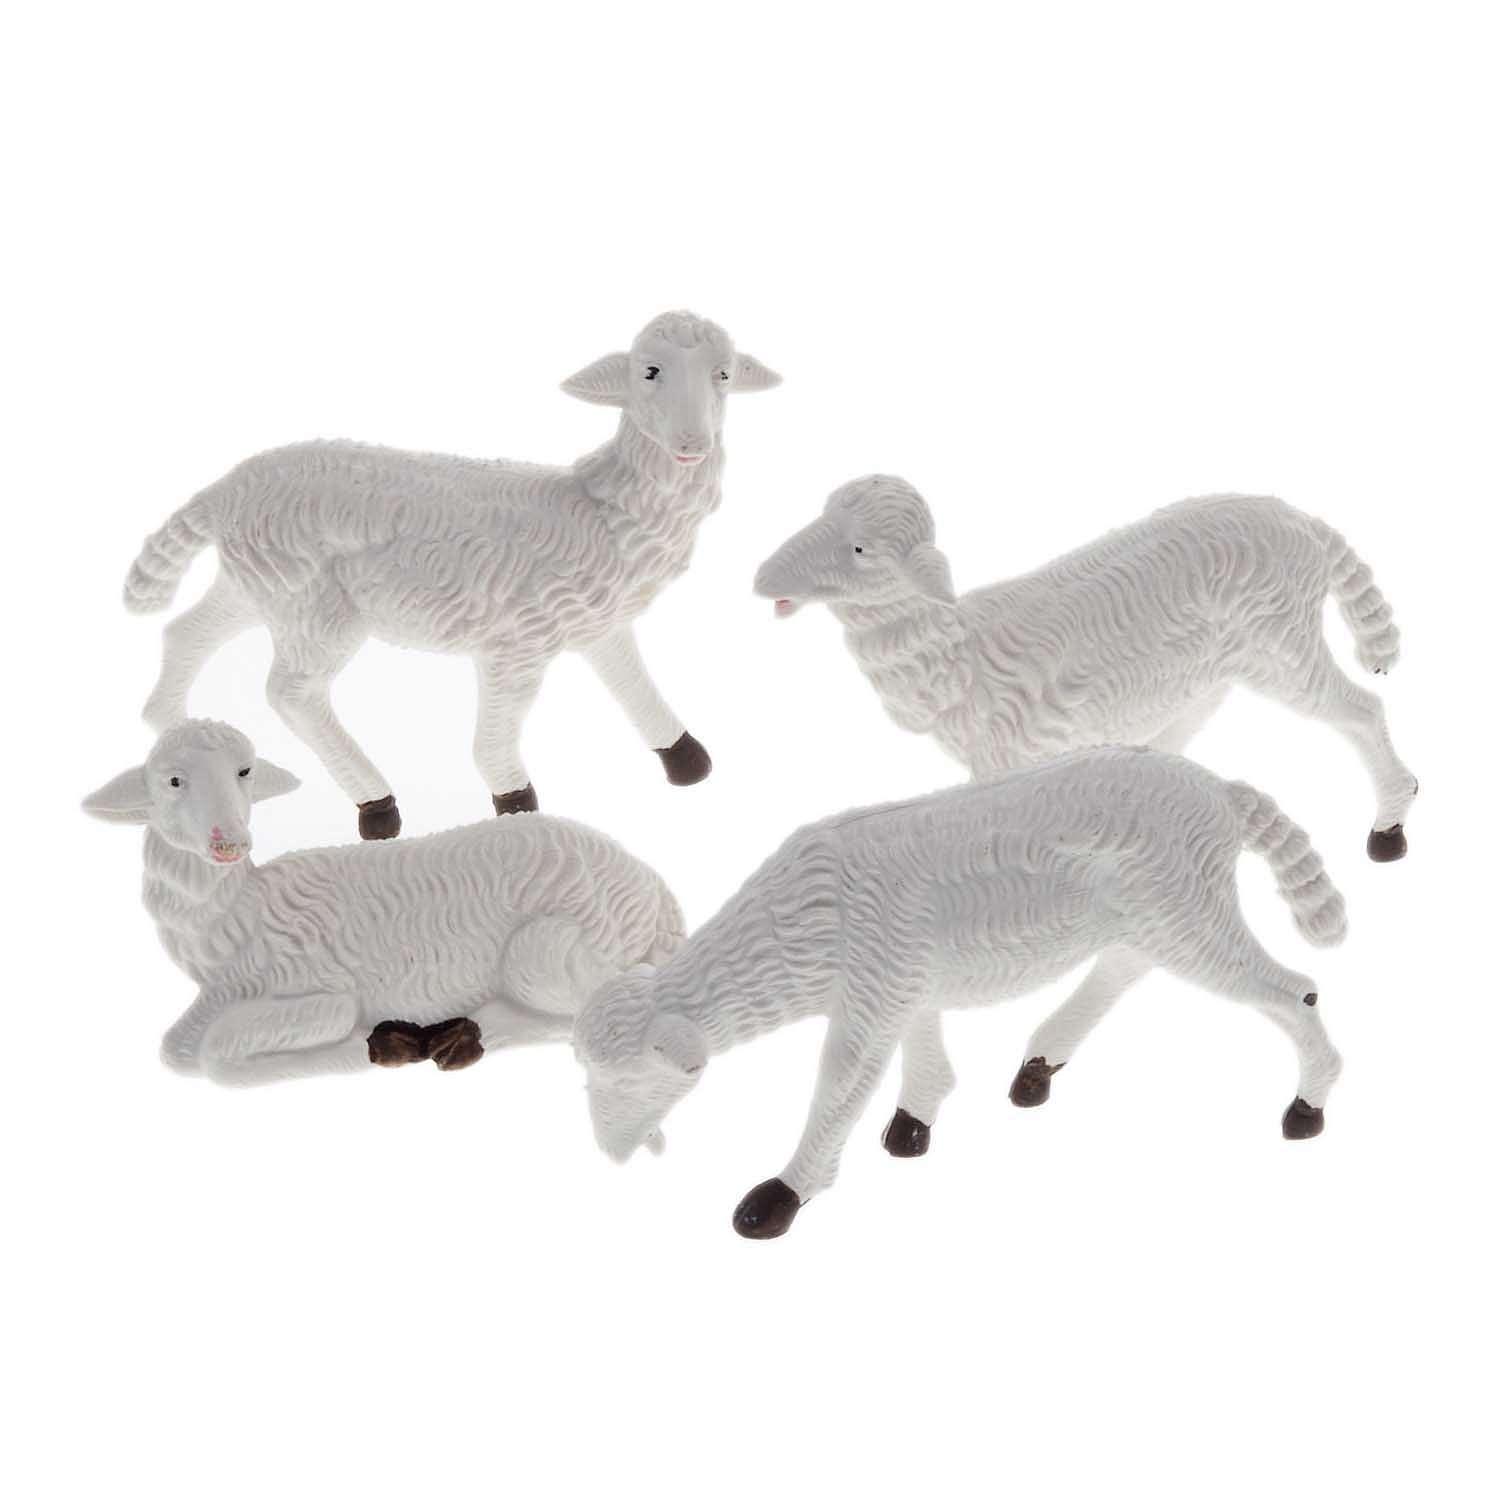 Nativity scene figurines, white plastic sheep, 4 pieces 16cm 3